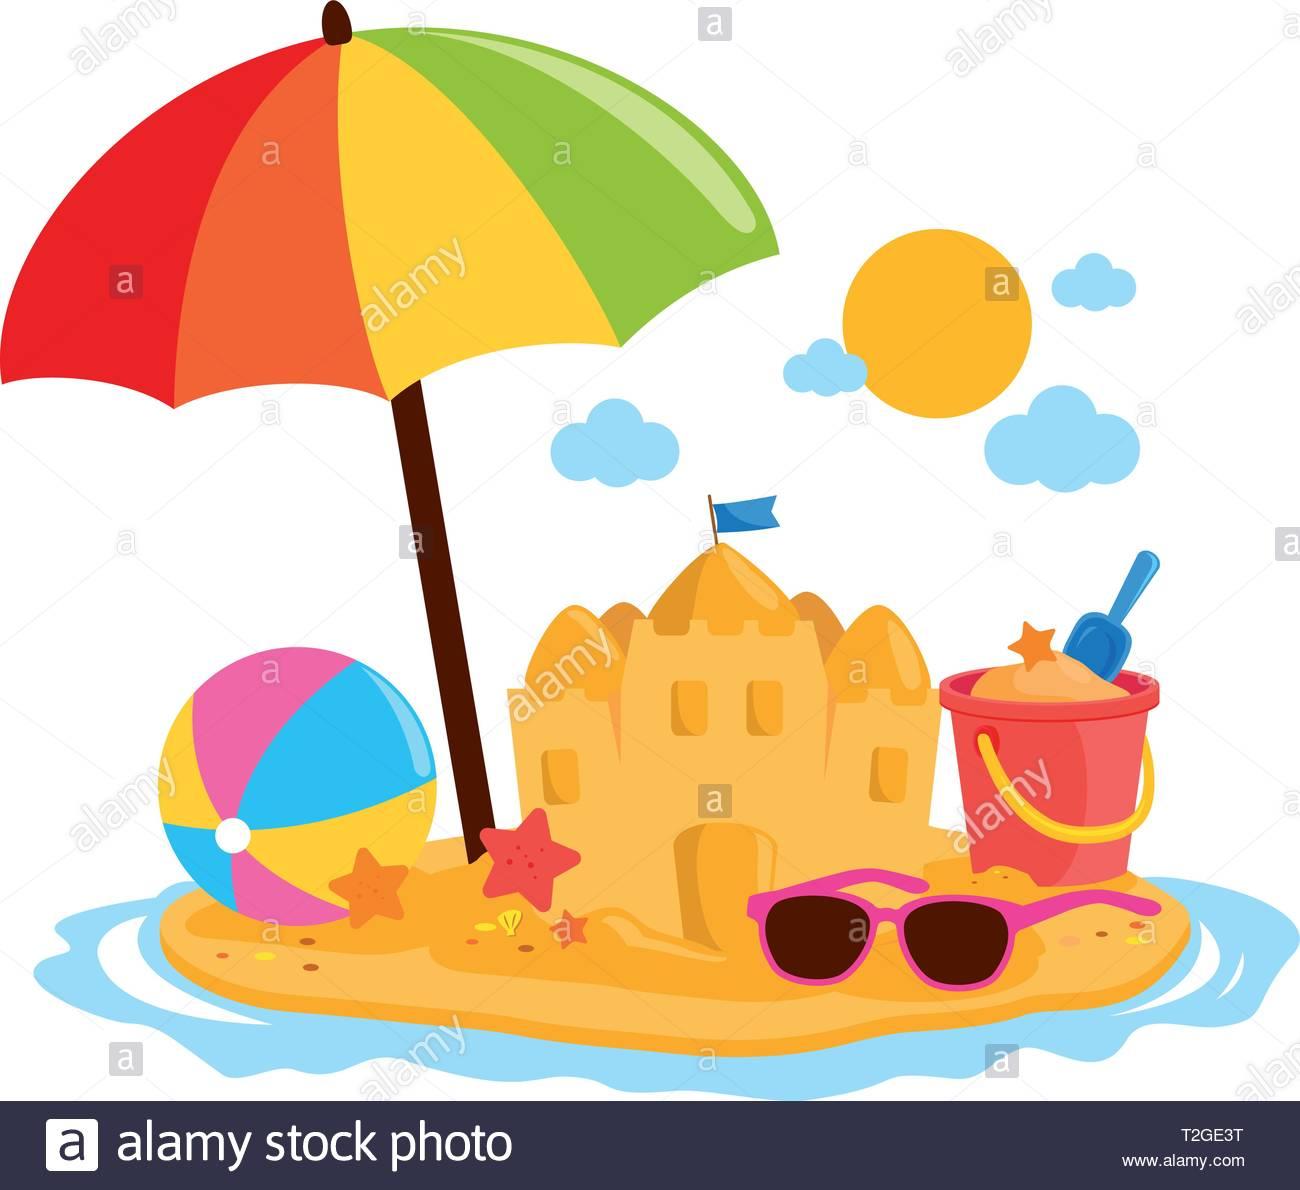 Beach summer vacation island with beach umbrella, a sandcastle, toy.